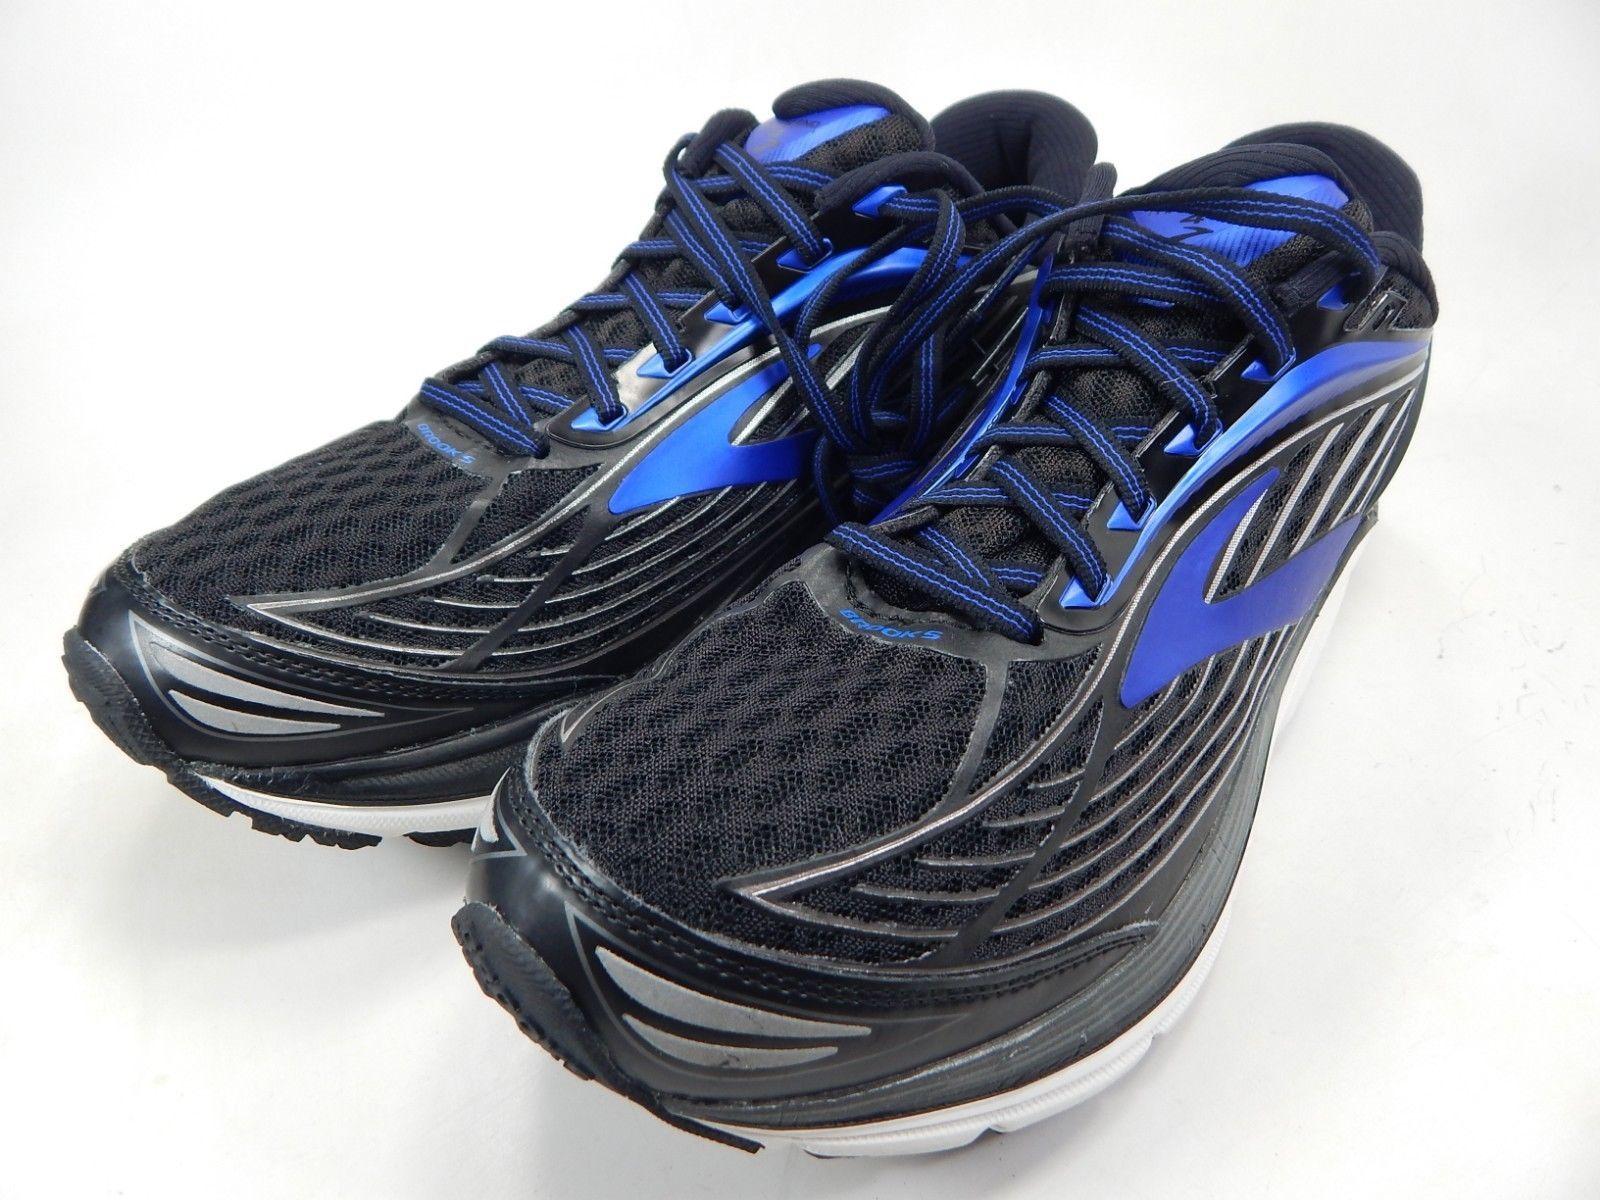 Brooks Transcend 4 Size US 10 M (D) EU 44 Men's Running Shoes Black 1102491D002 image 3